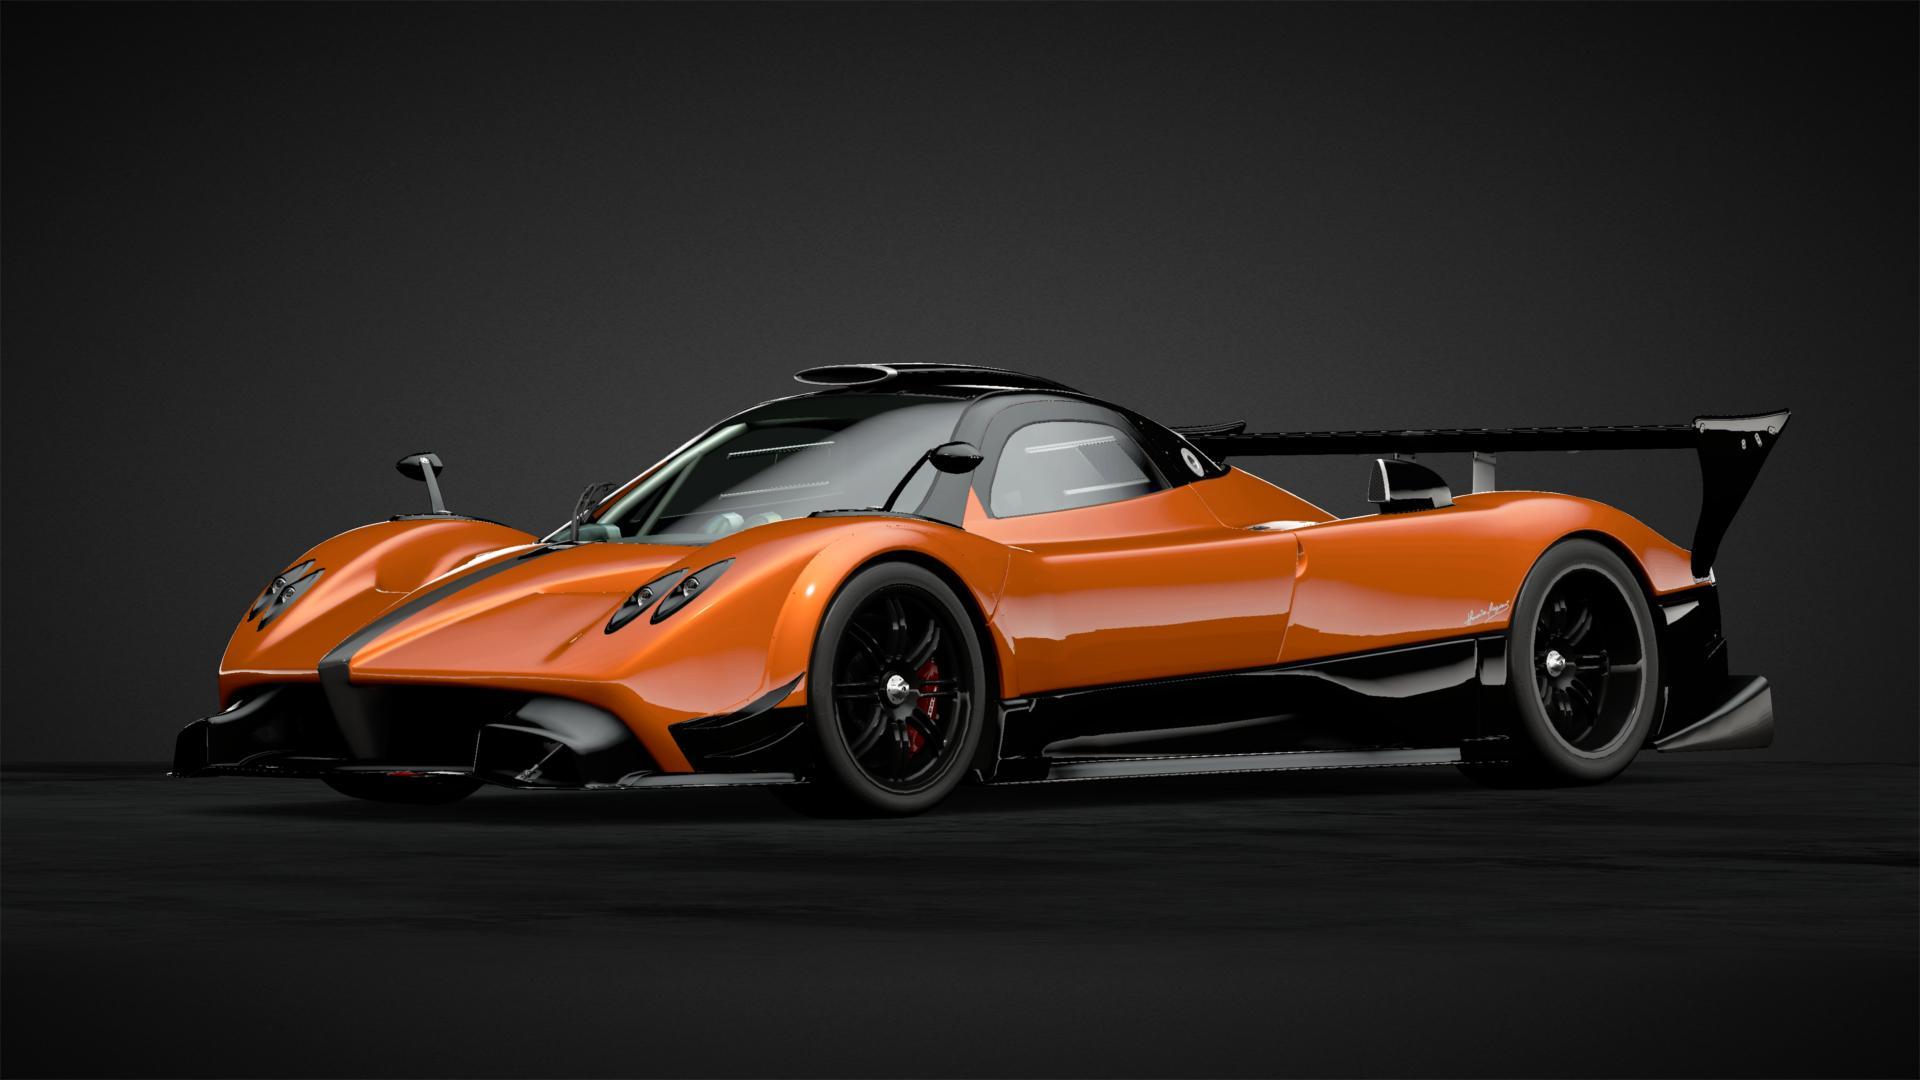 Pagani Zonda Cinque Nfs Edition Car Livery By V4 Rocketcloud Community Gran Turismo Sport